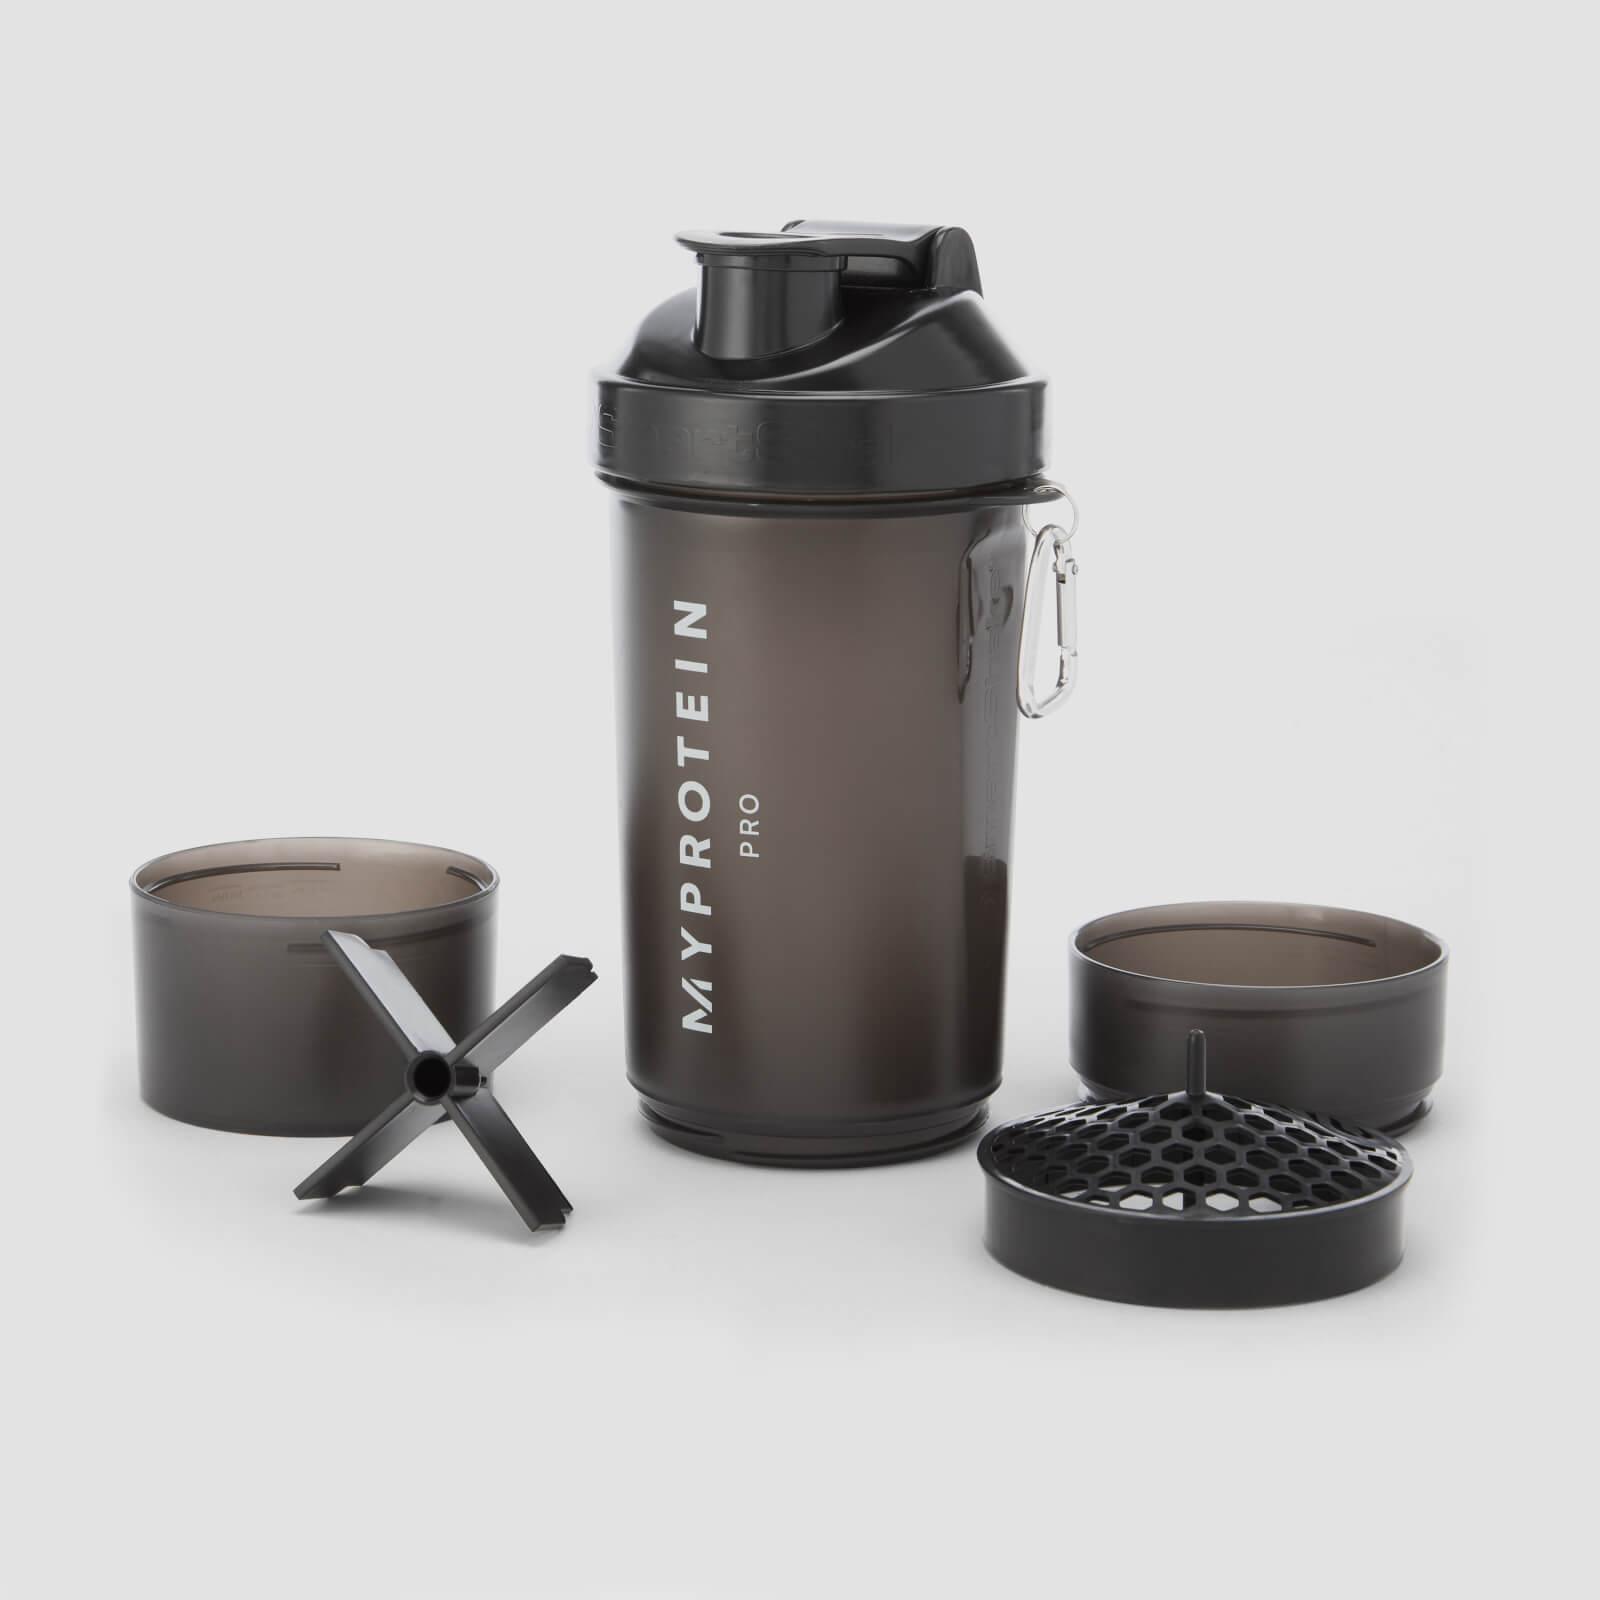 Christmas Gift Guide 2020 for Him - Myprotein Smartshake Shaker